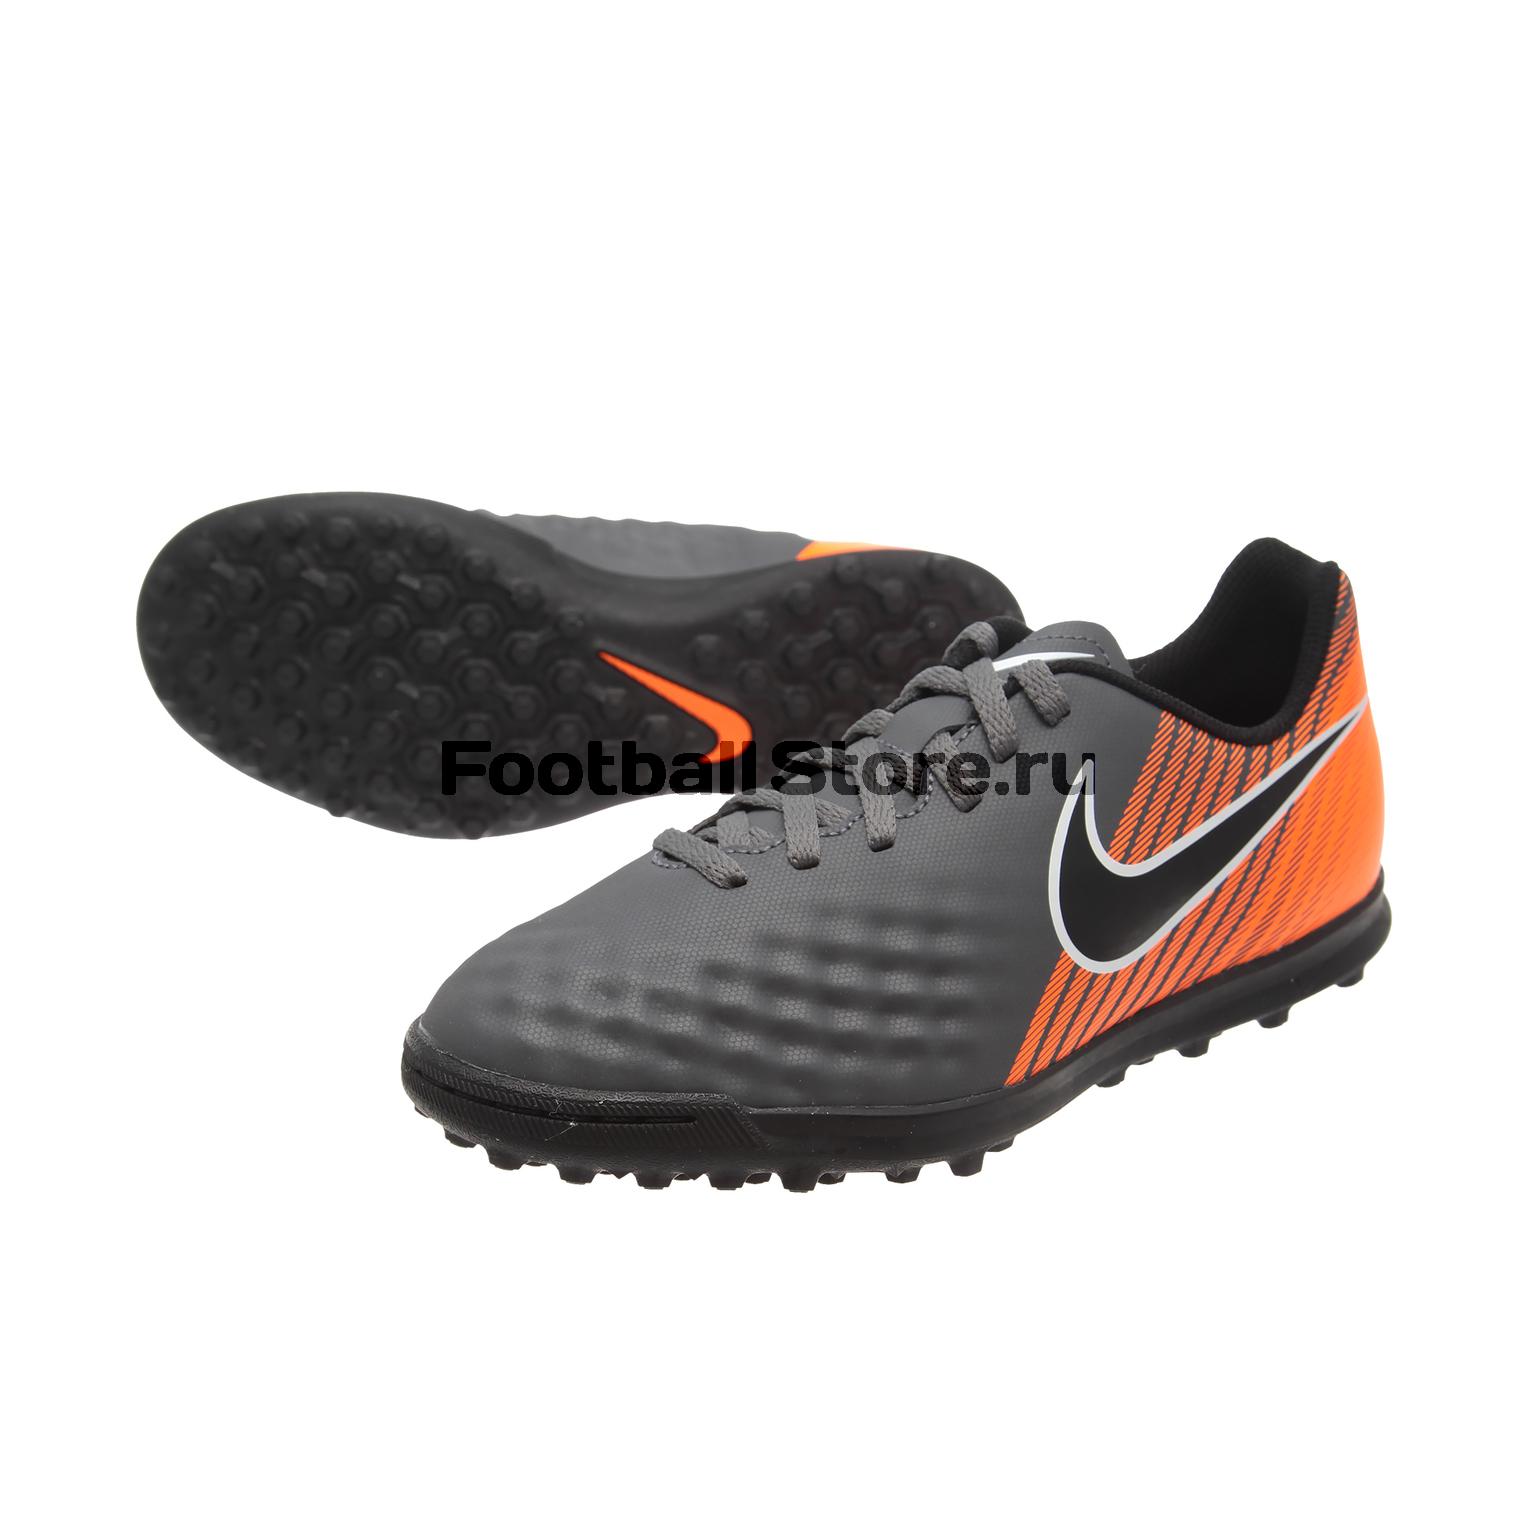 Шиповки Nike JR ObraX 2 Club TF AH7317-080 детские бутсы nike бутсы nike jr phantom 3 elite df fg ah7292 081